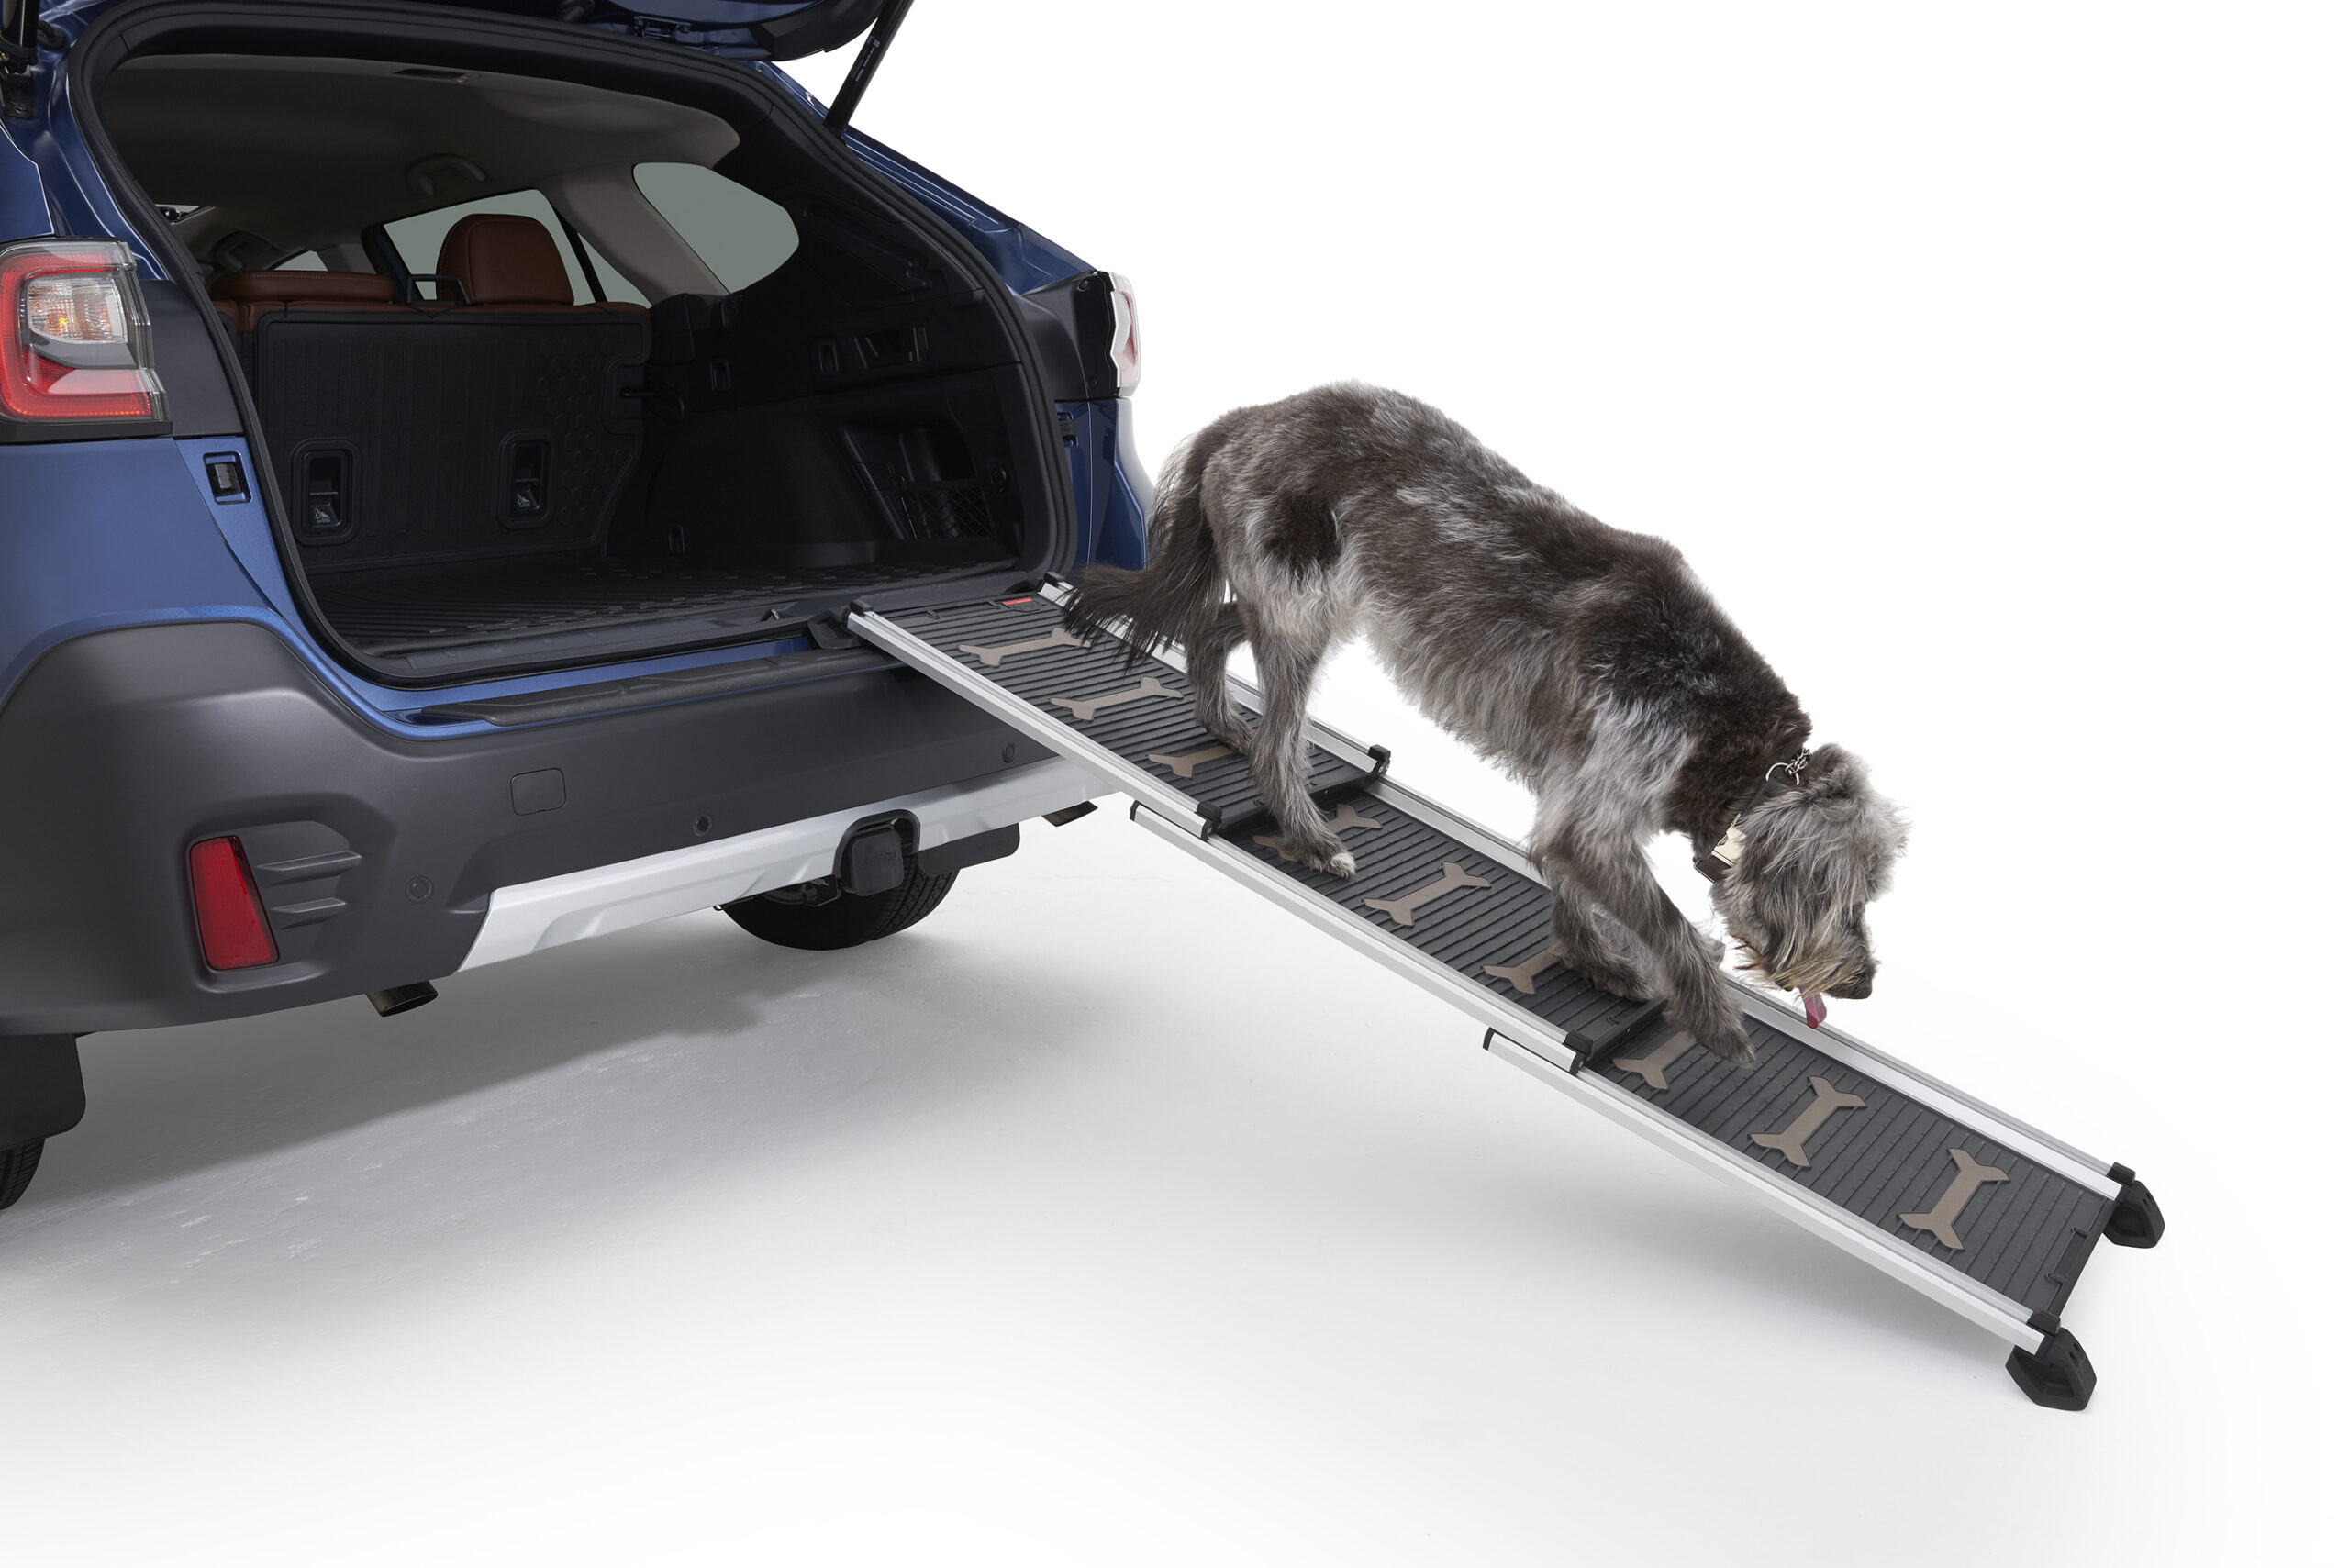 Subaru pet accessories dog ramp.